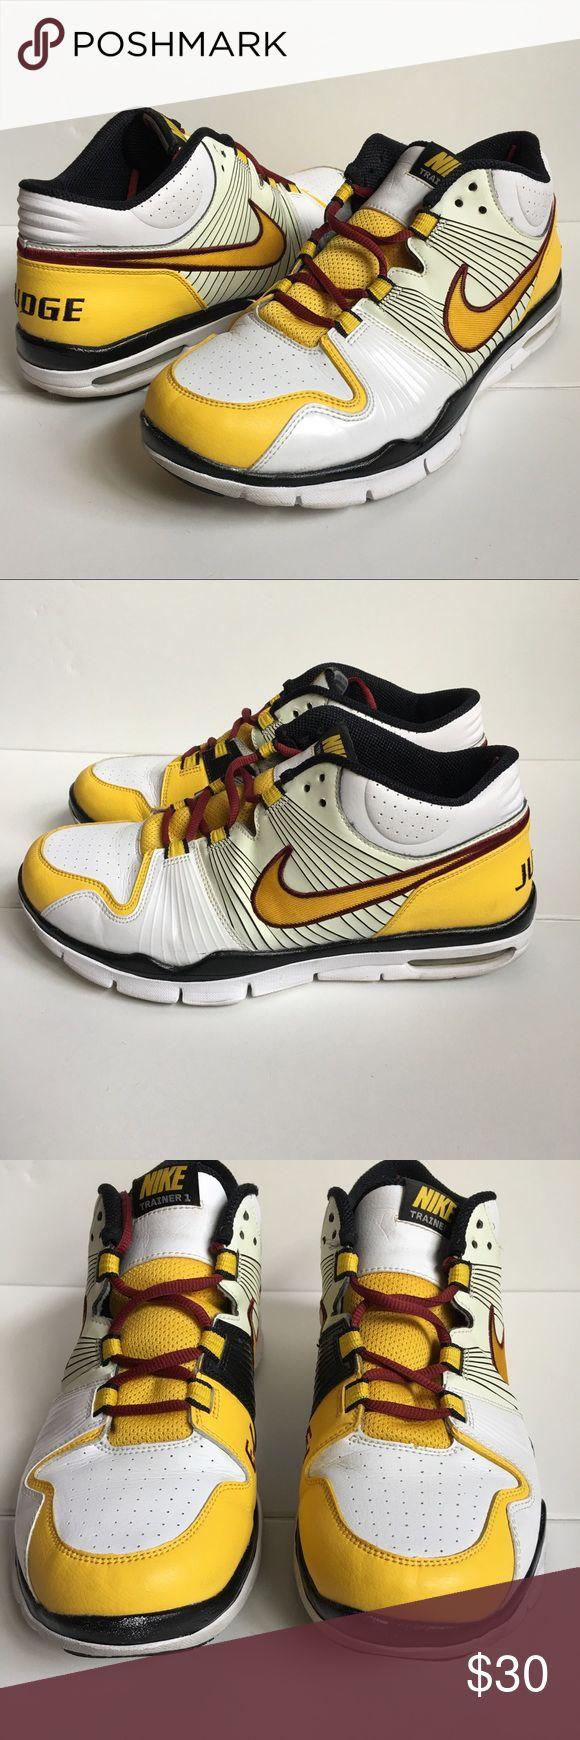 "Nike Trainer 1 ID ""Judge"" men's size 11 Nike Trainer 1 ID ""Judge"" men's size 11 Shoes Athletic Shoes"